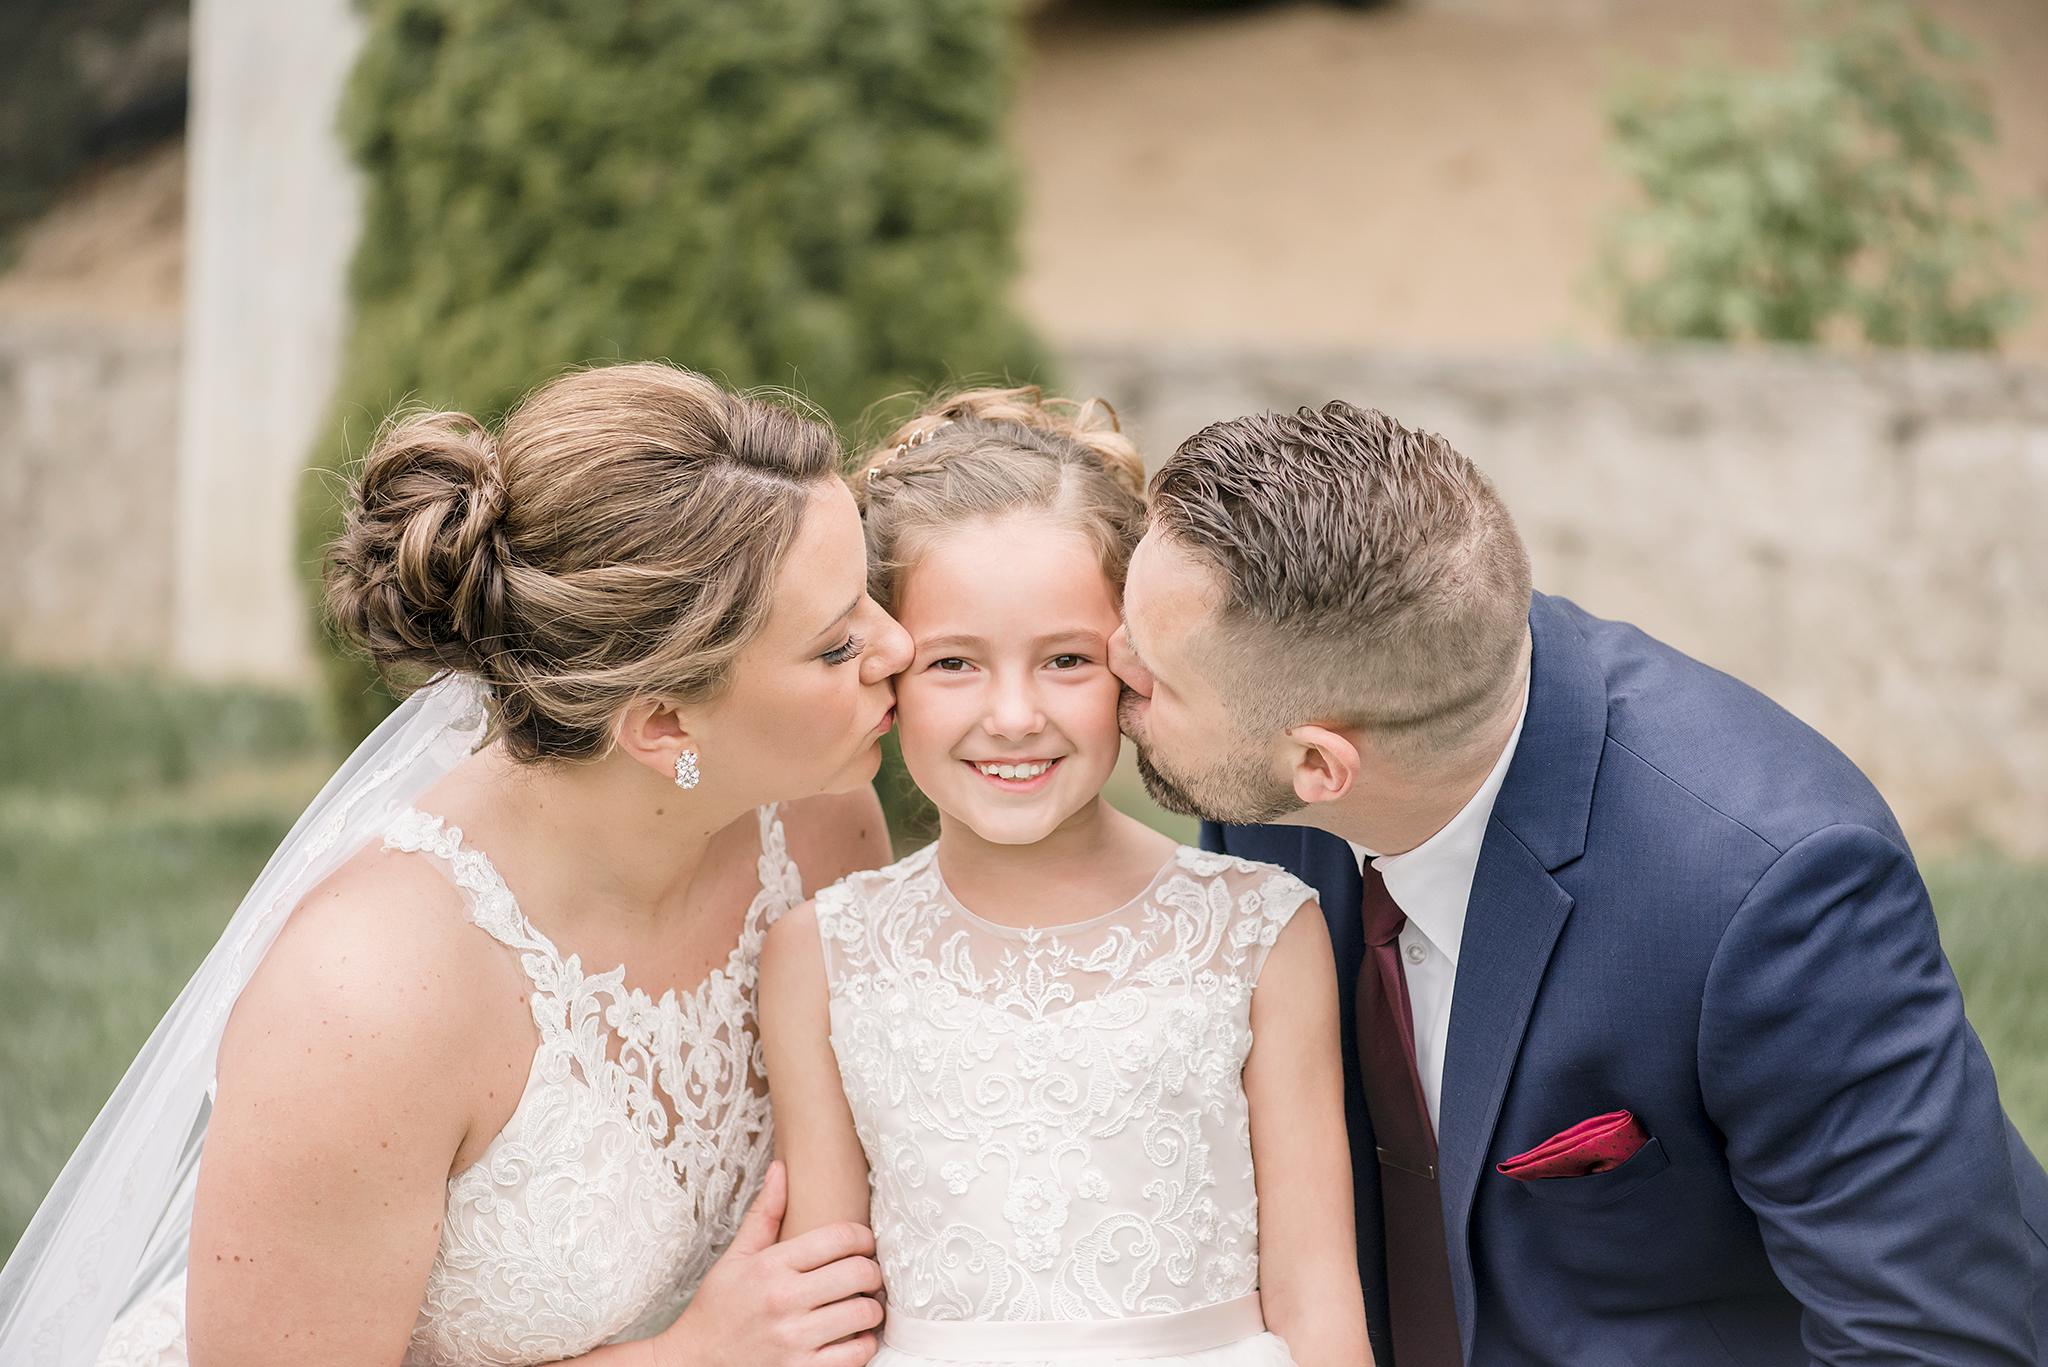 LINDSAY-ADKINS-PHOTOGRAPHY-MICHIGAN-WEDDING-PHOTOGRAPHER-FRANKENMUTH-BREWERY-WEDDING-MICHIGAN-BLOG-41